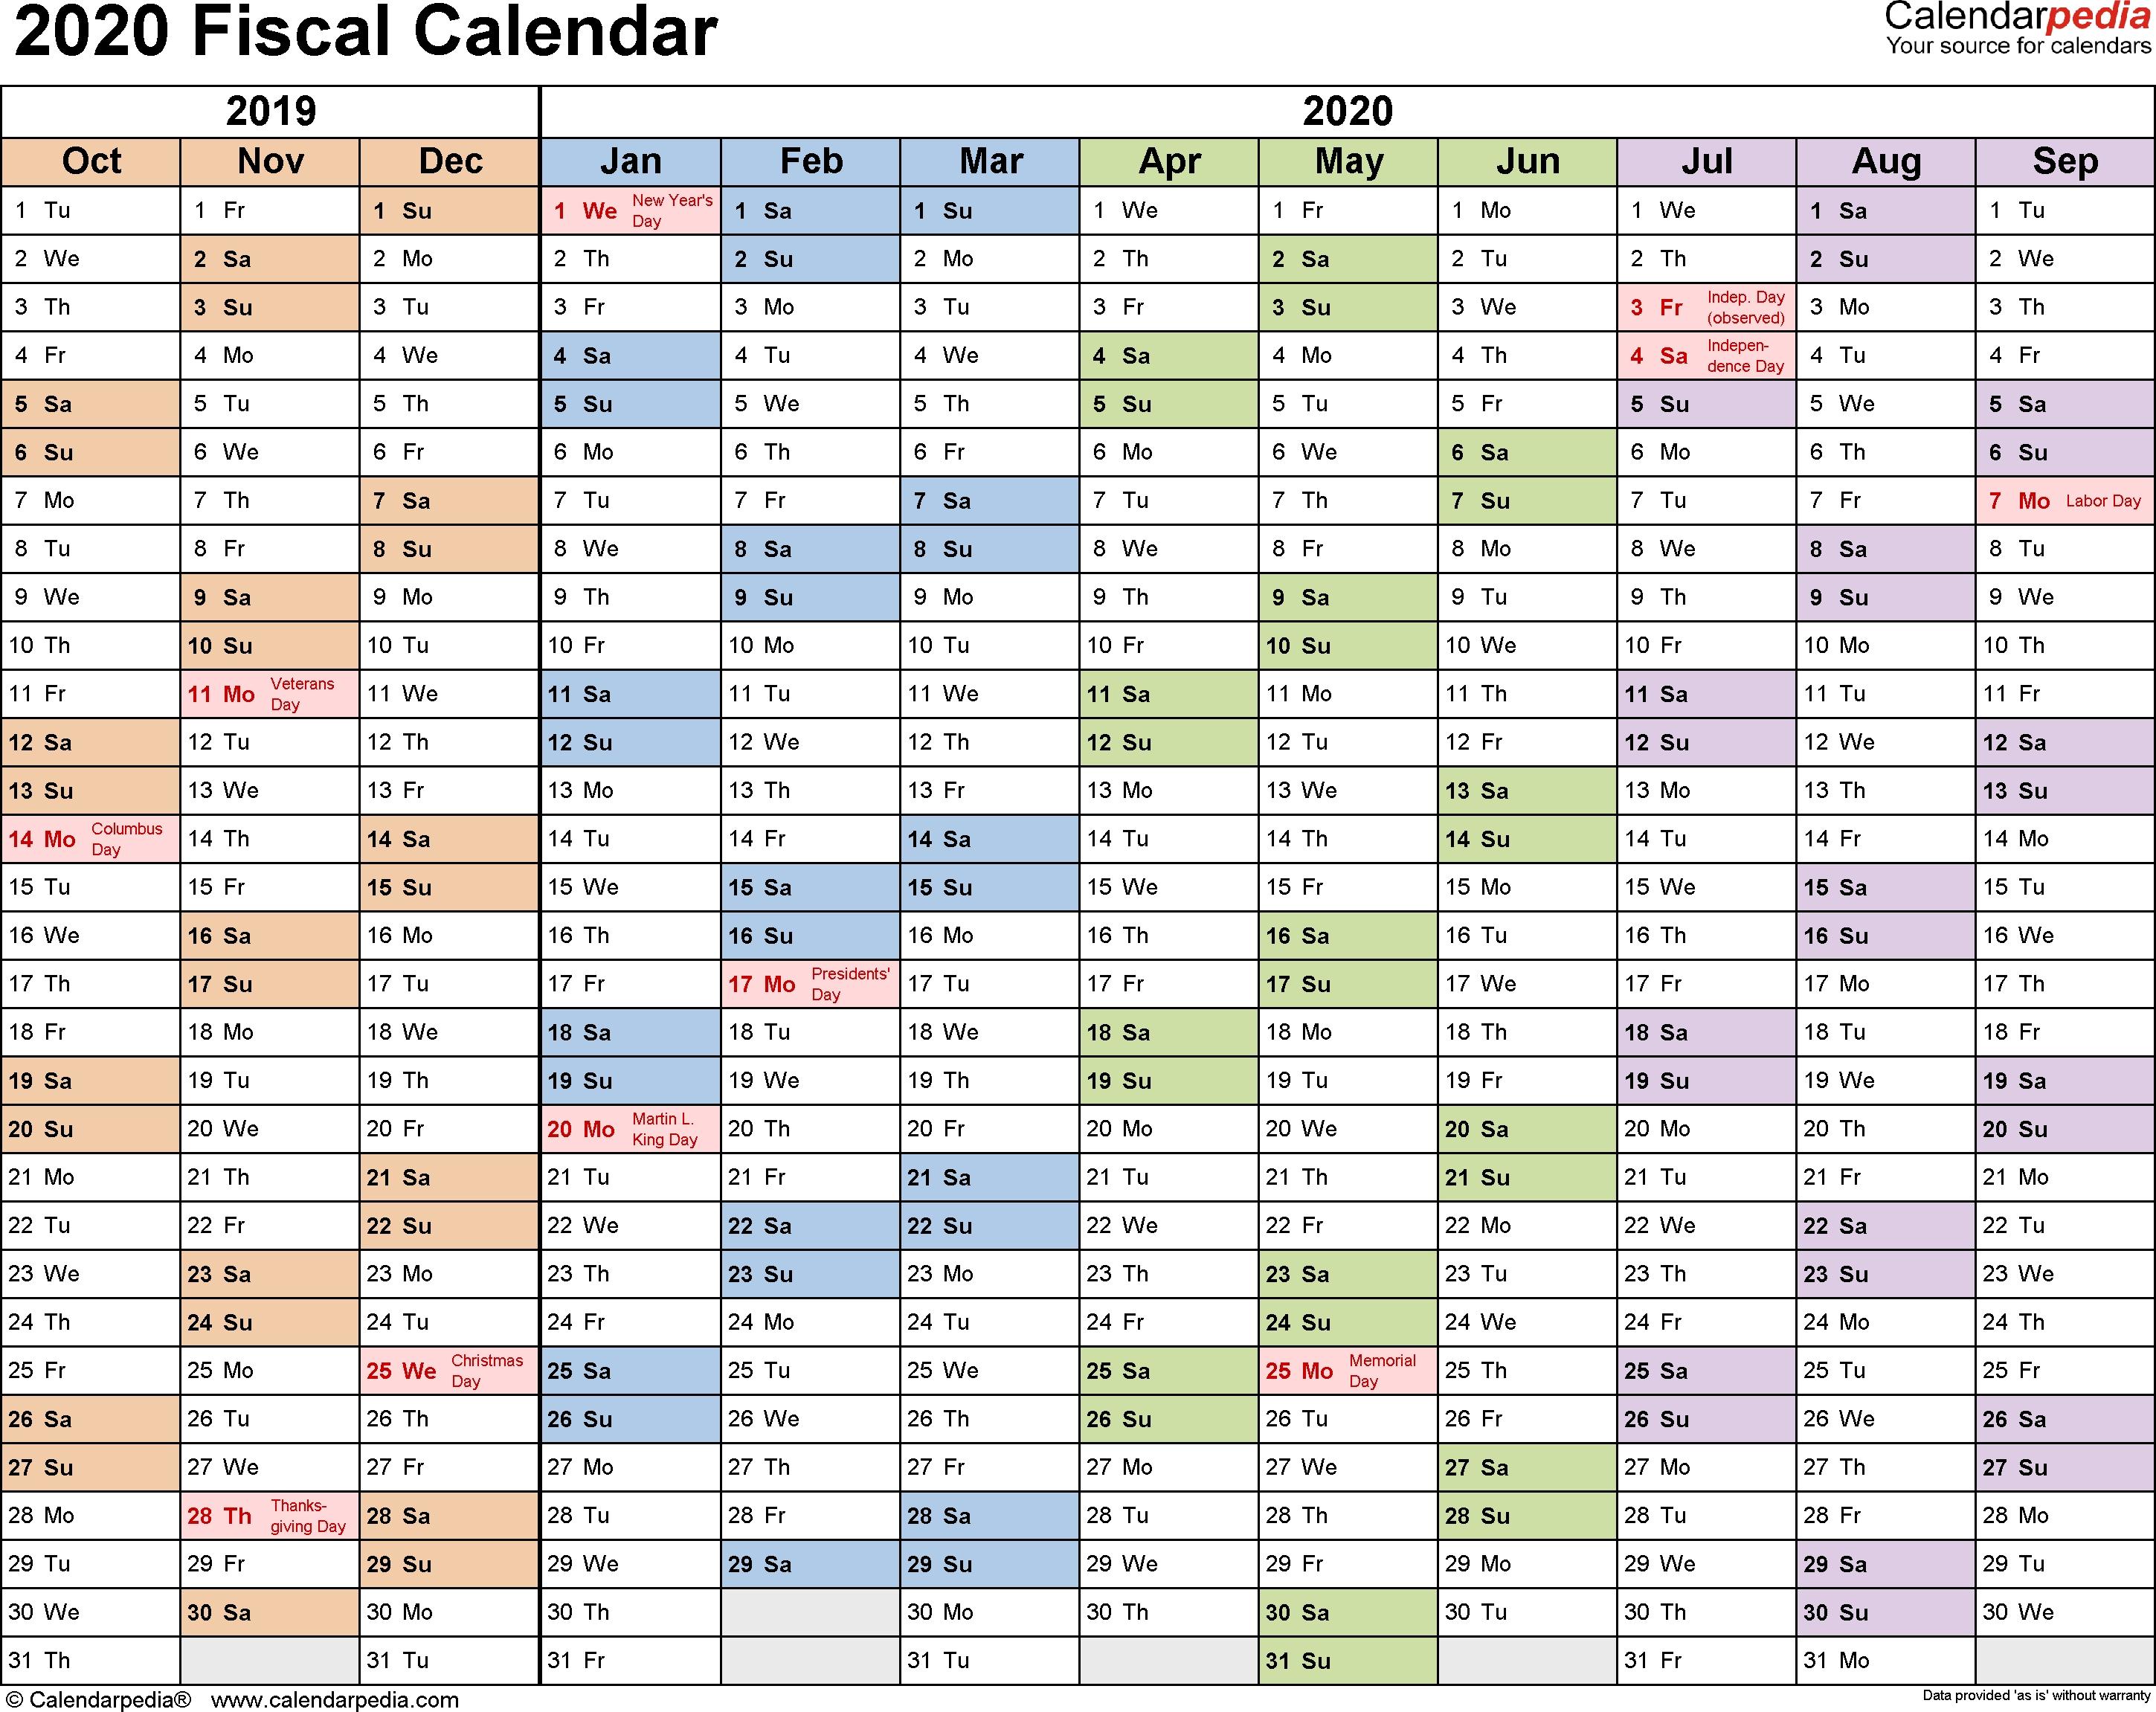 Fy 2020 Calendar - Colona.rsd7 with Financial Calendar 2019- 2020 Printable.au